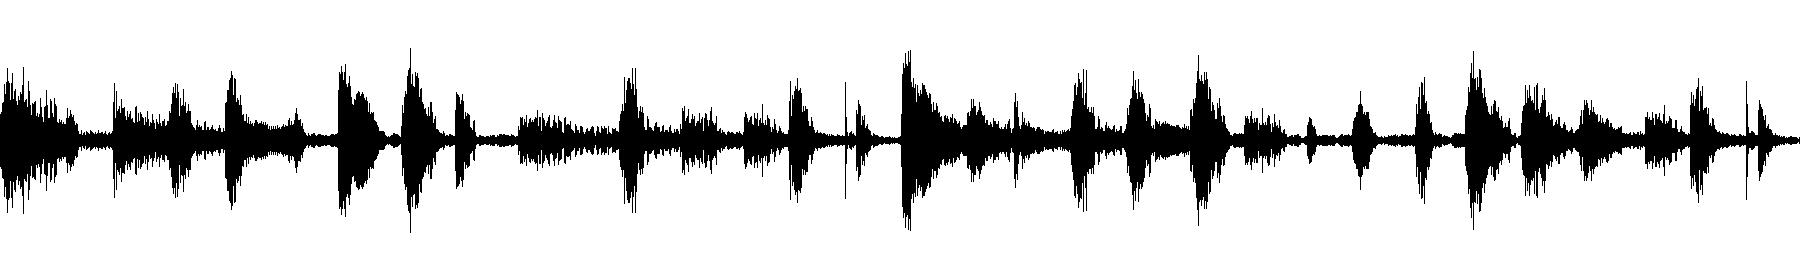 g abs05 078